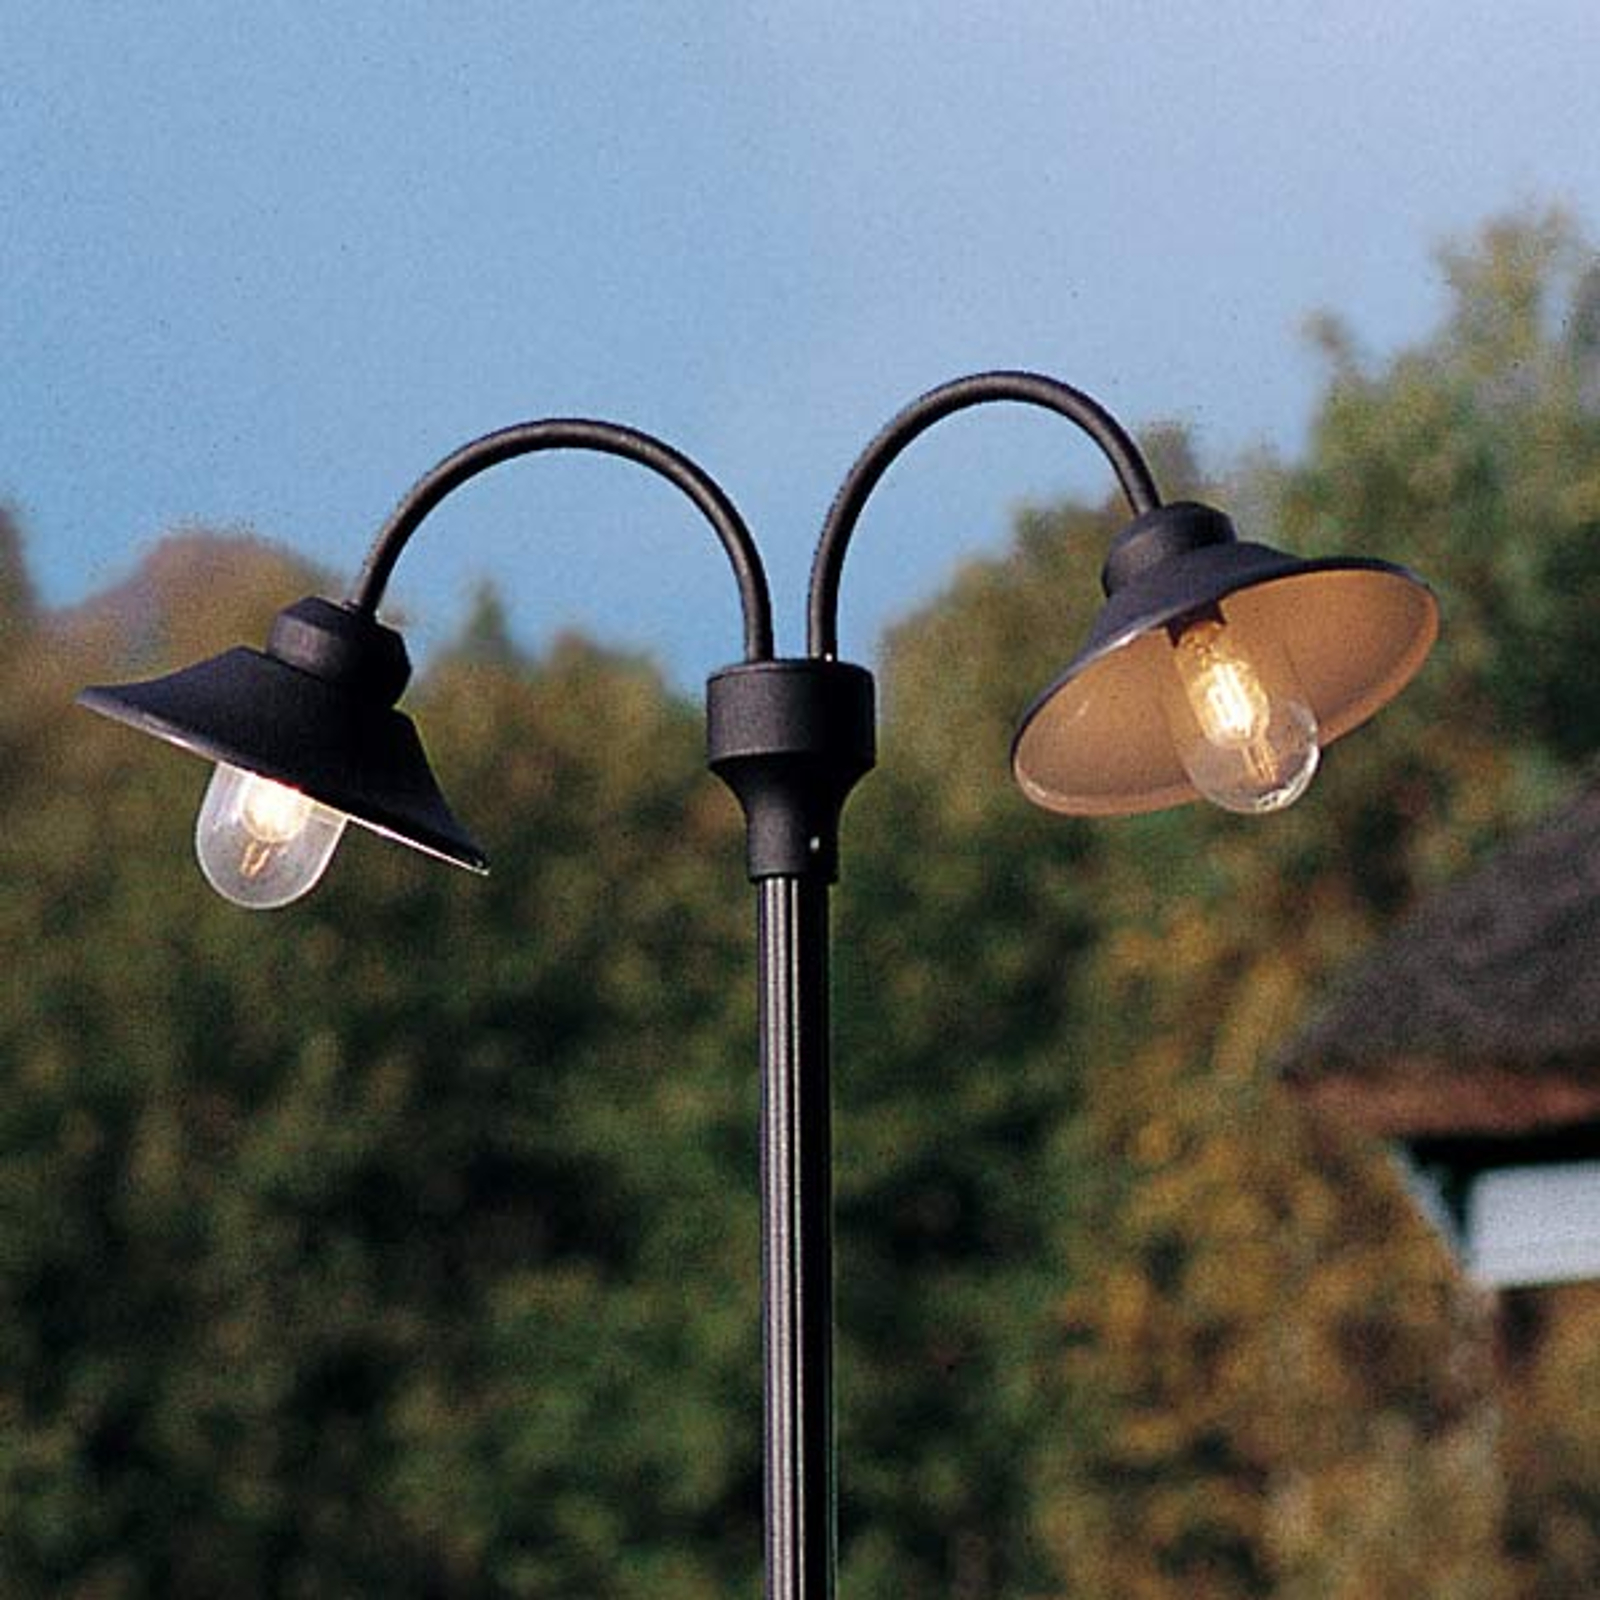 Lampadaire deux lampes VEGA, noir mat